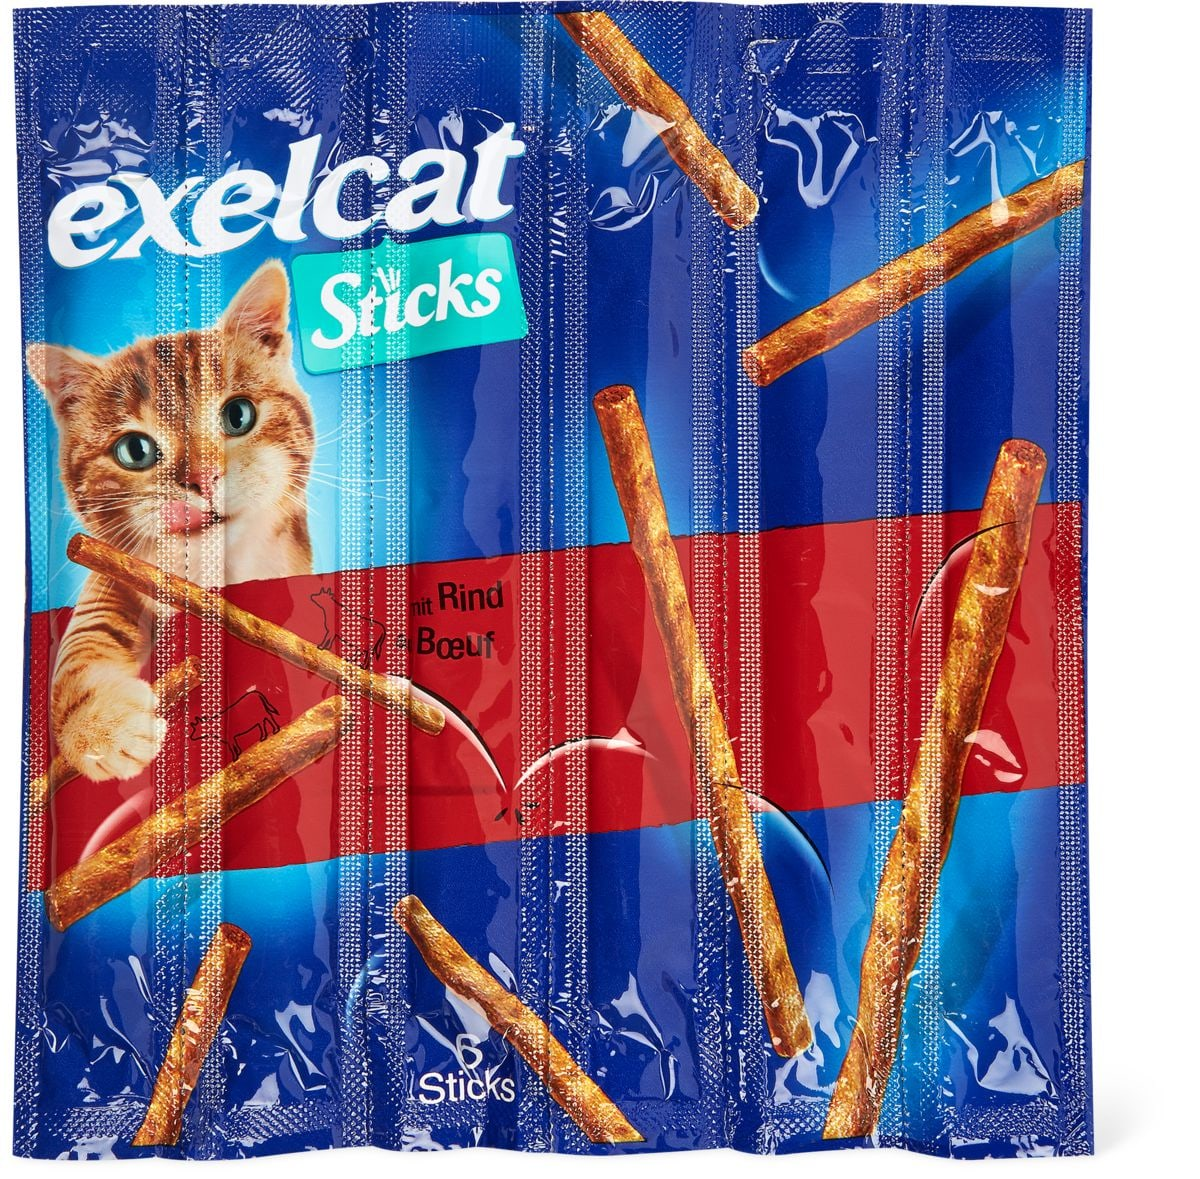 Exelcat Sticks manzo